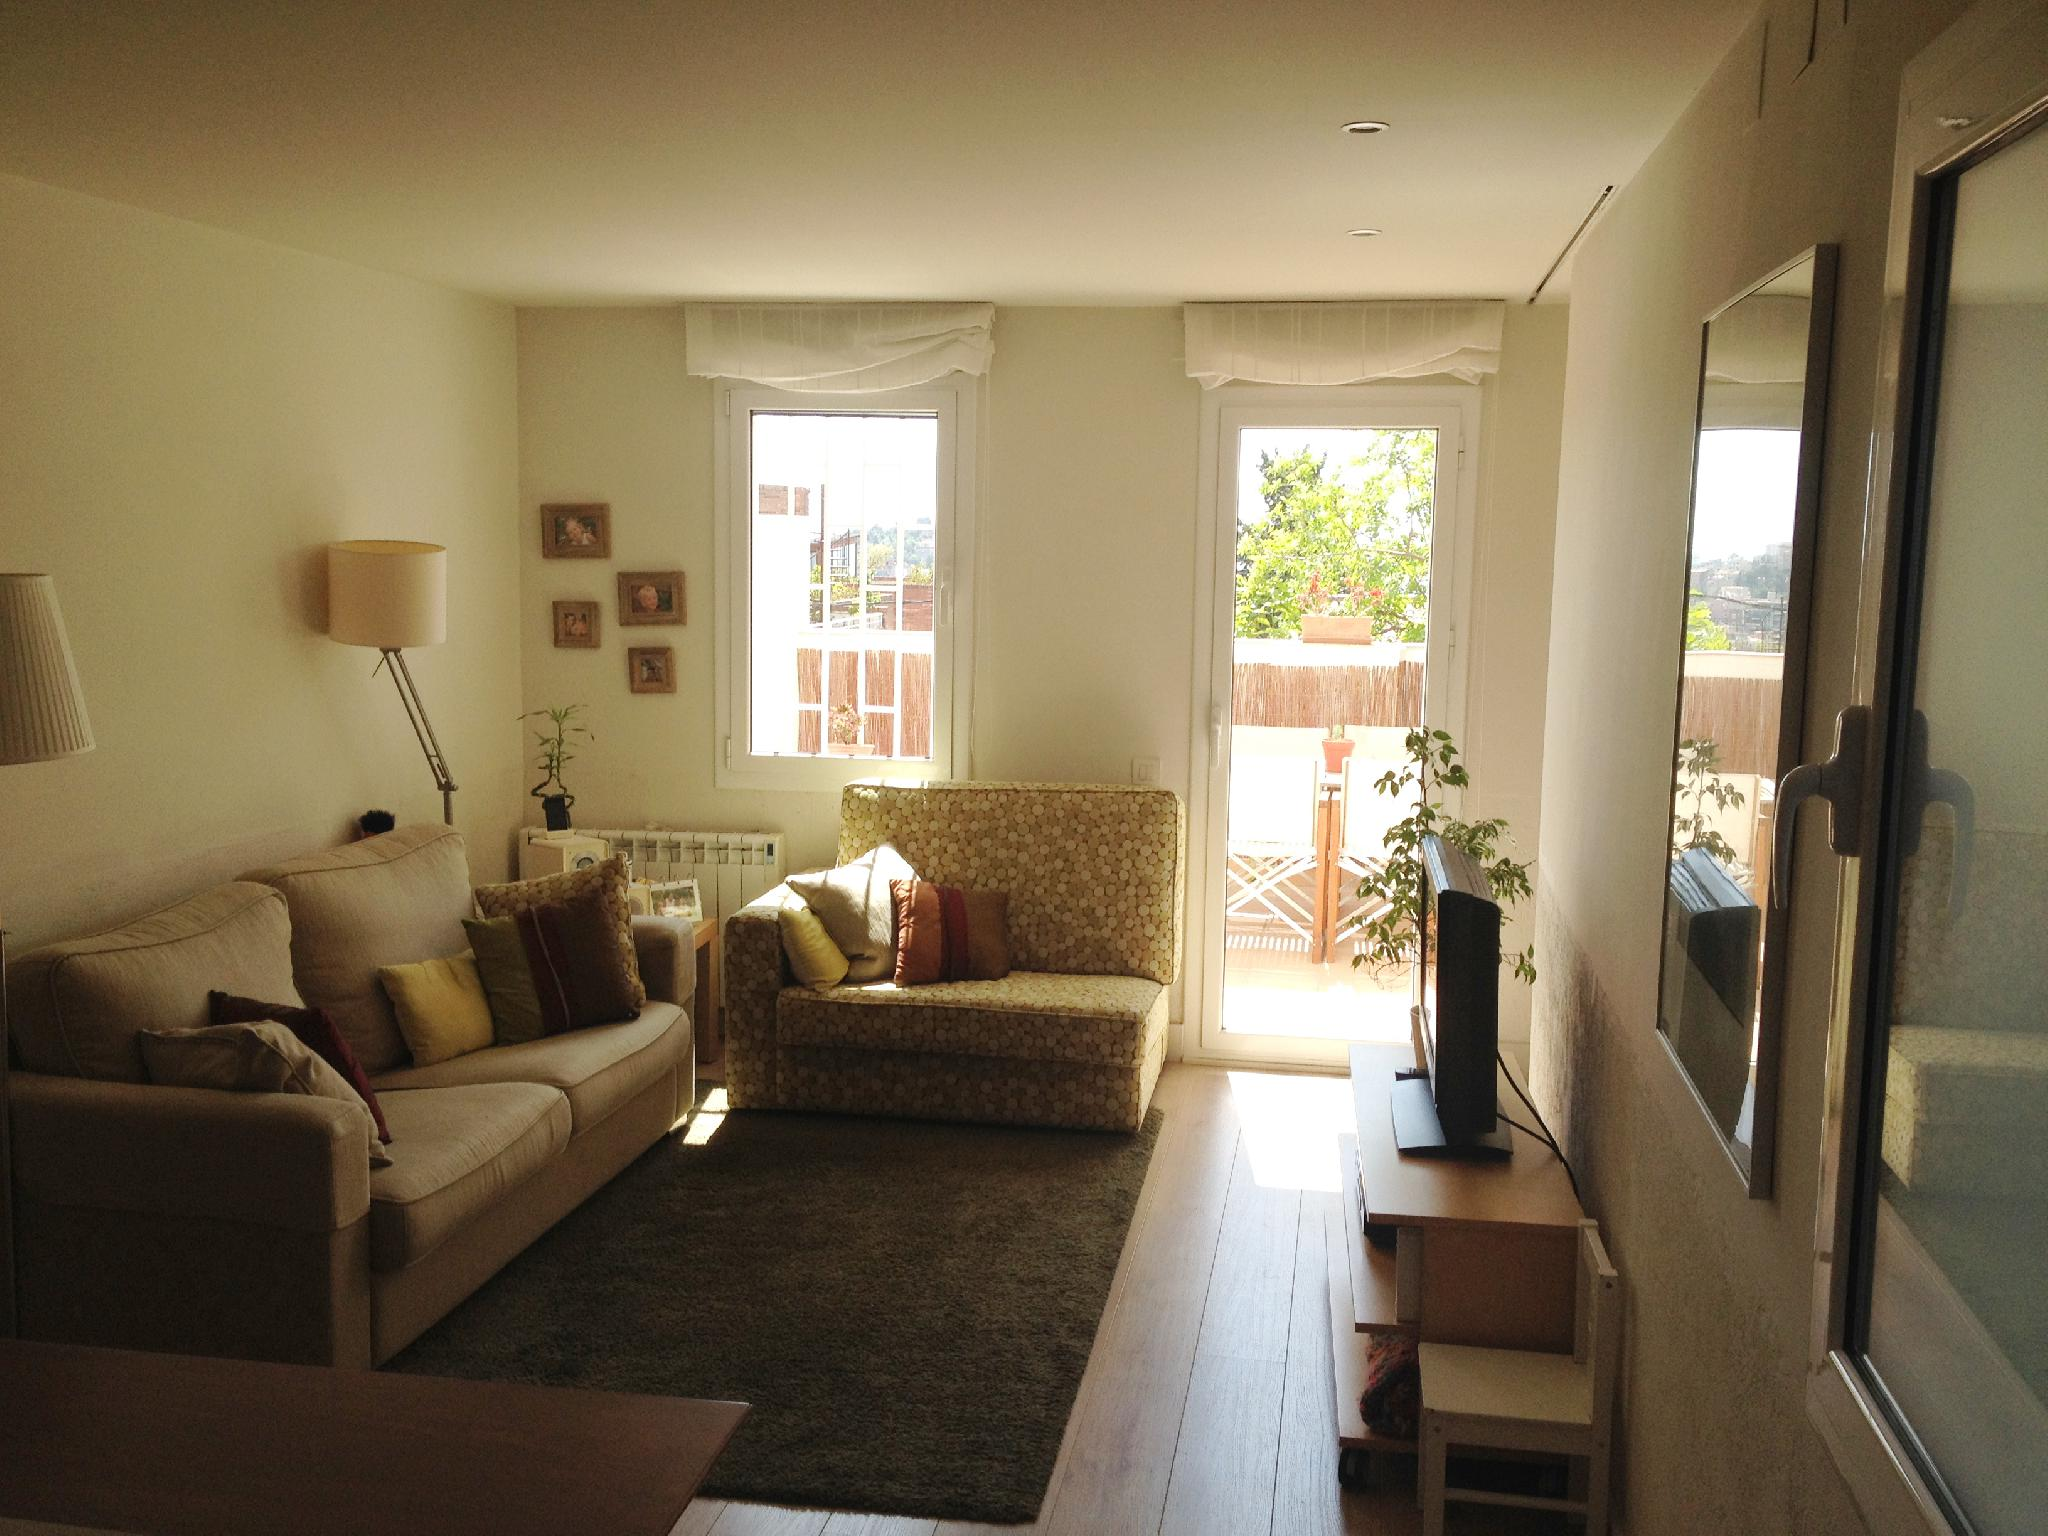 petit-appartement-de-vente-a-rosellaticia-cerca-plaza-de-alfonso-comin-y-rondas-vallcarca-a-barcelona-215562243